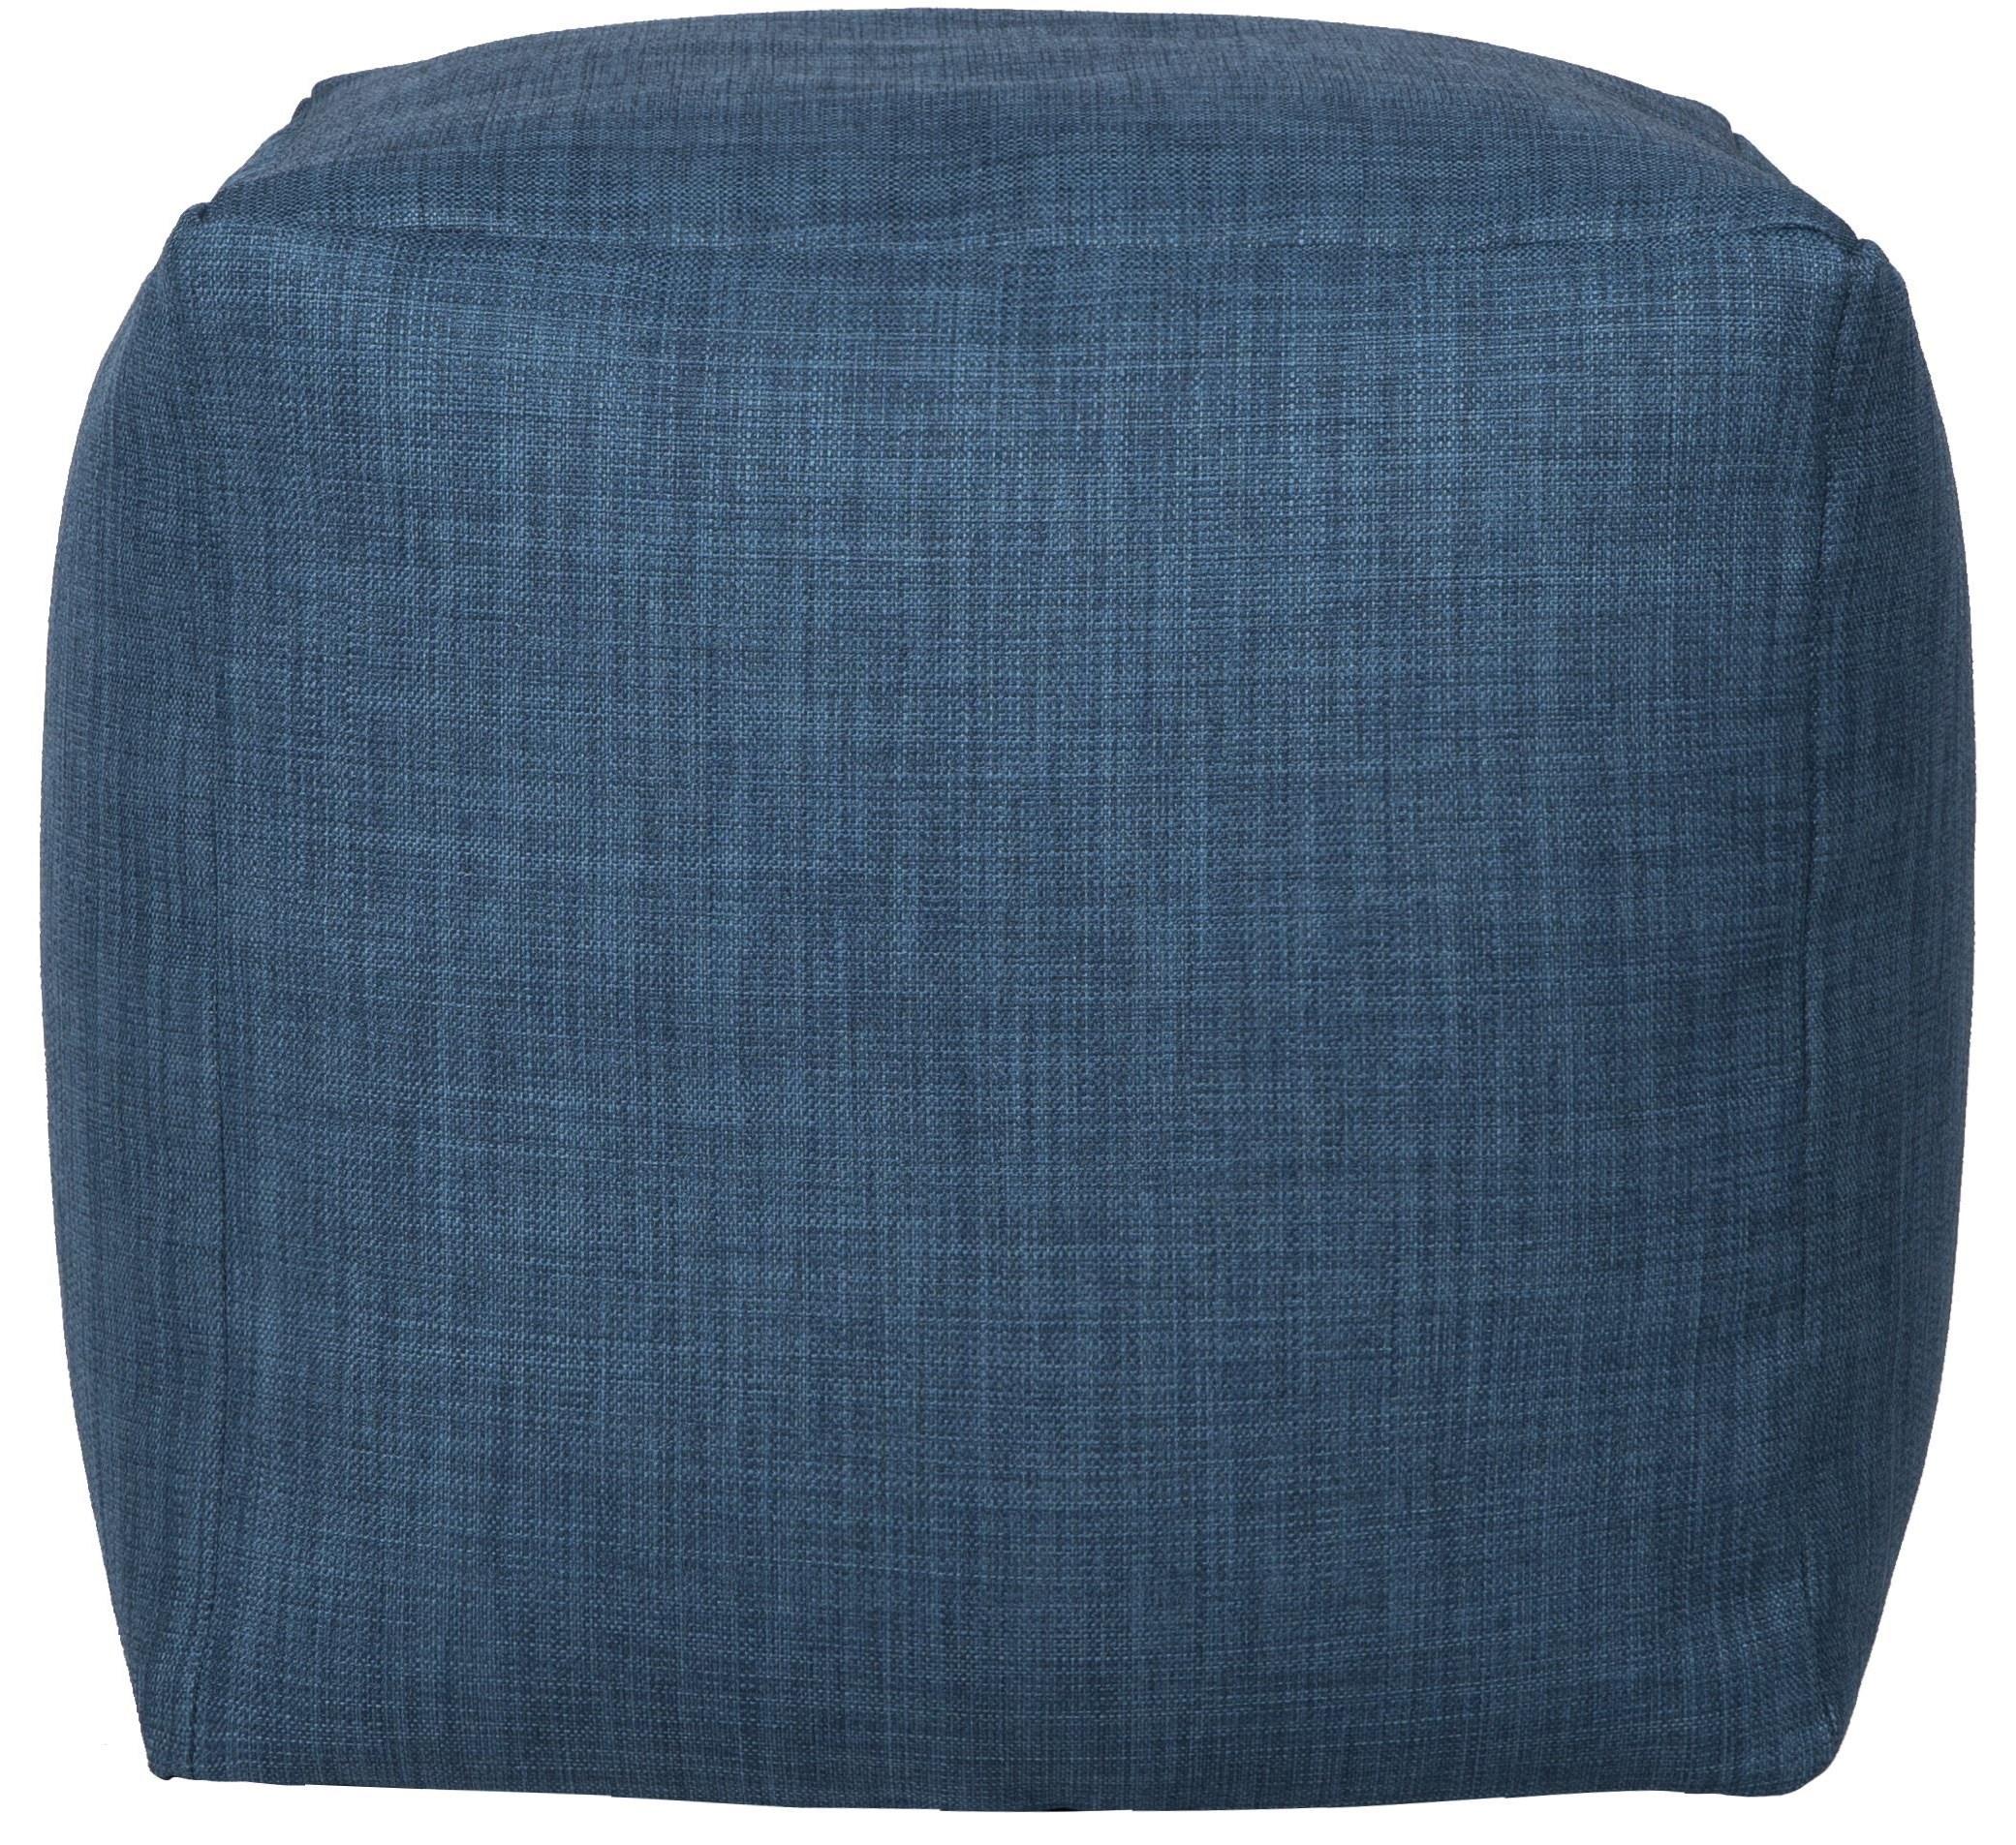 Canvas Blue Cube Beanbag